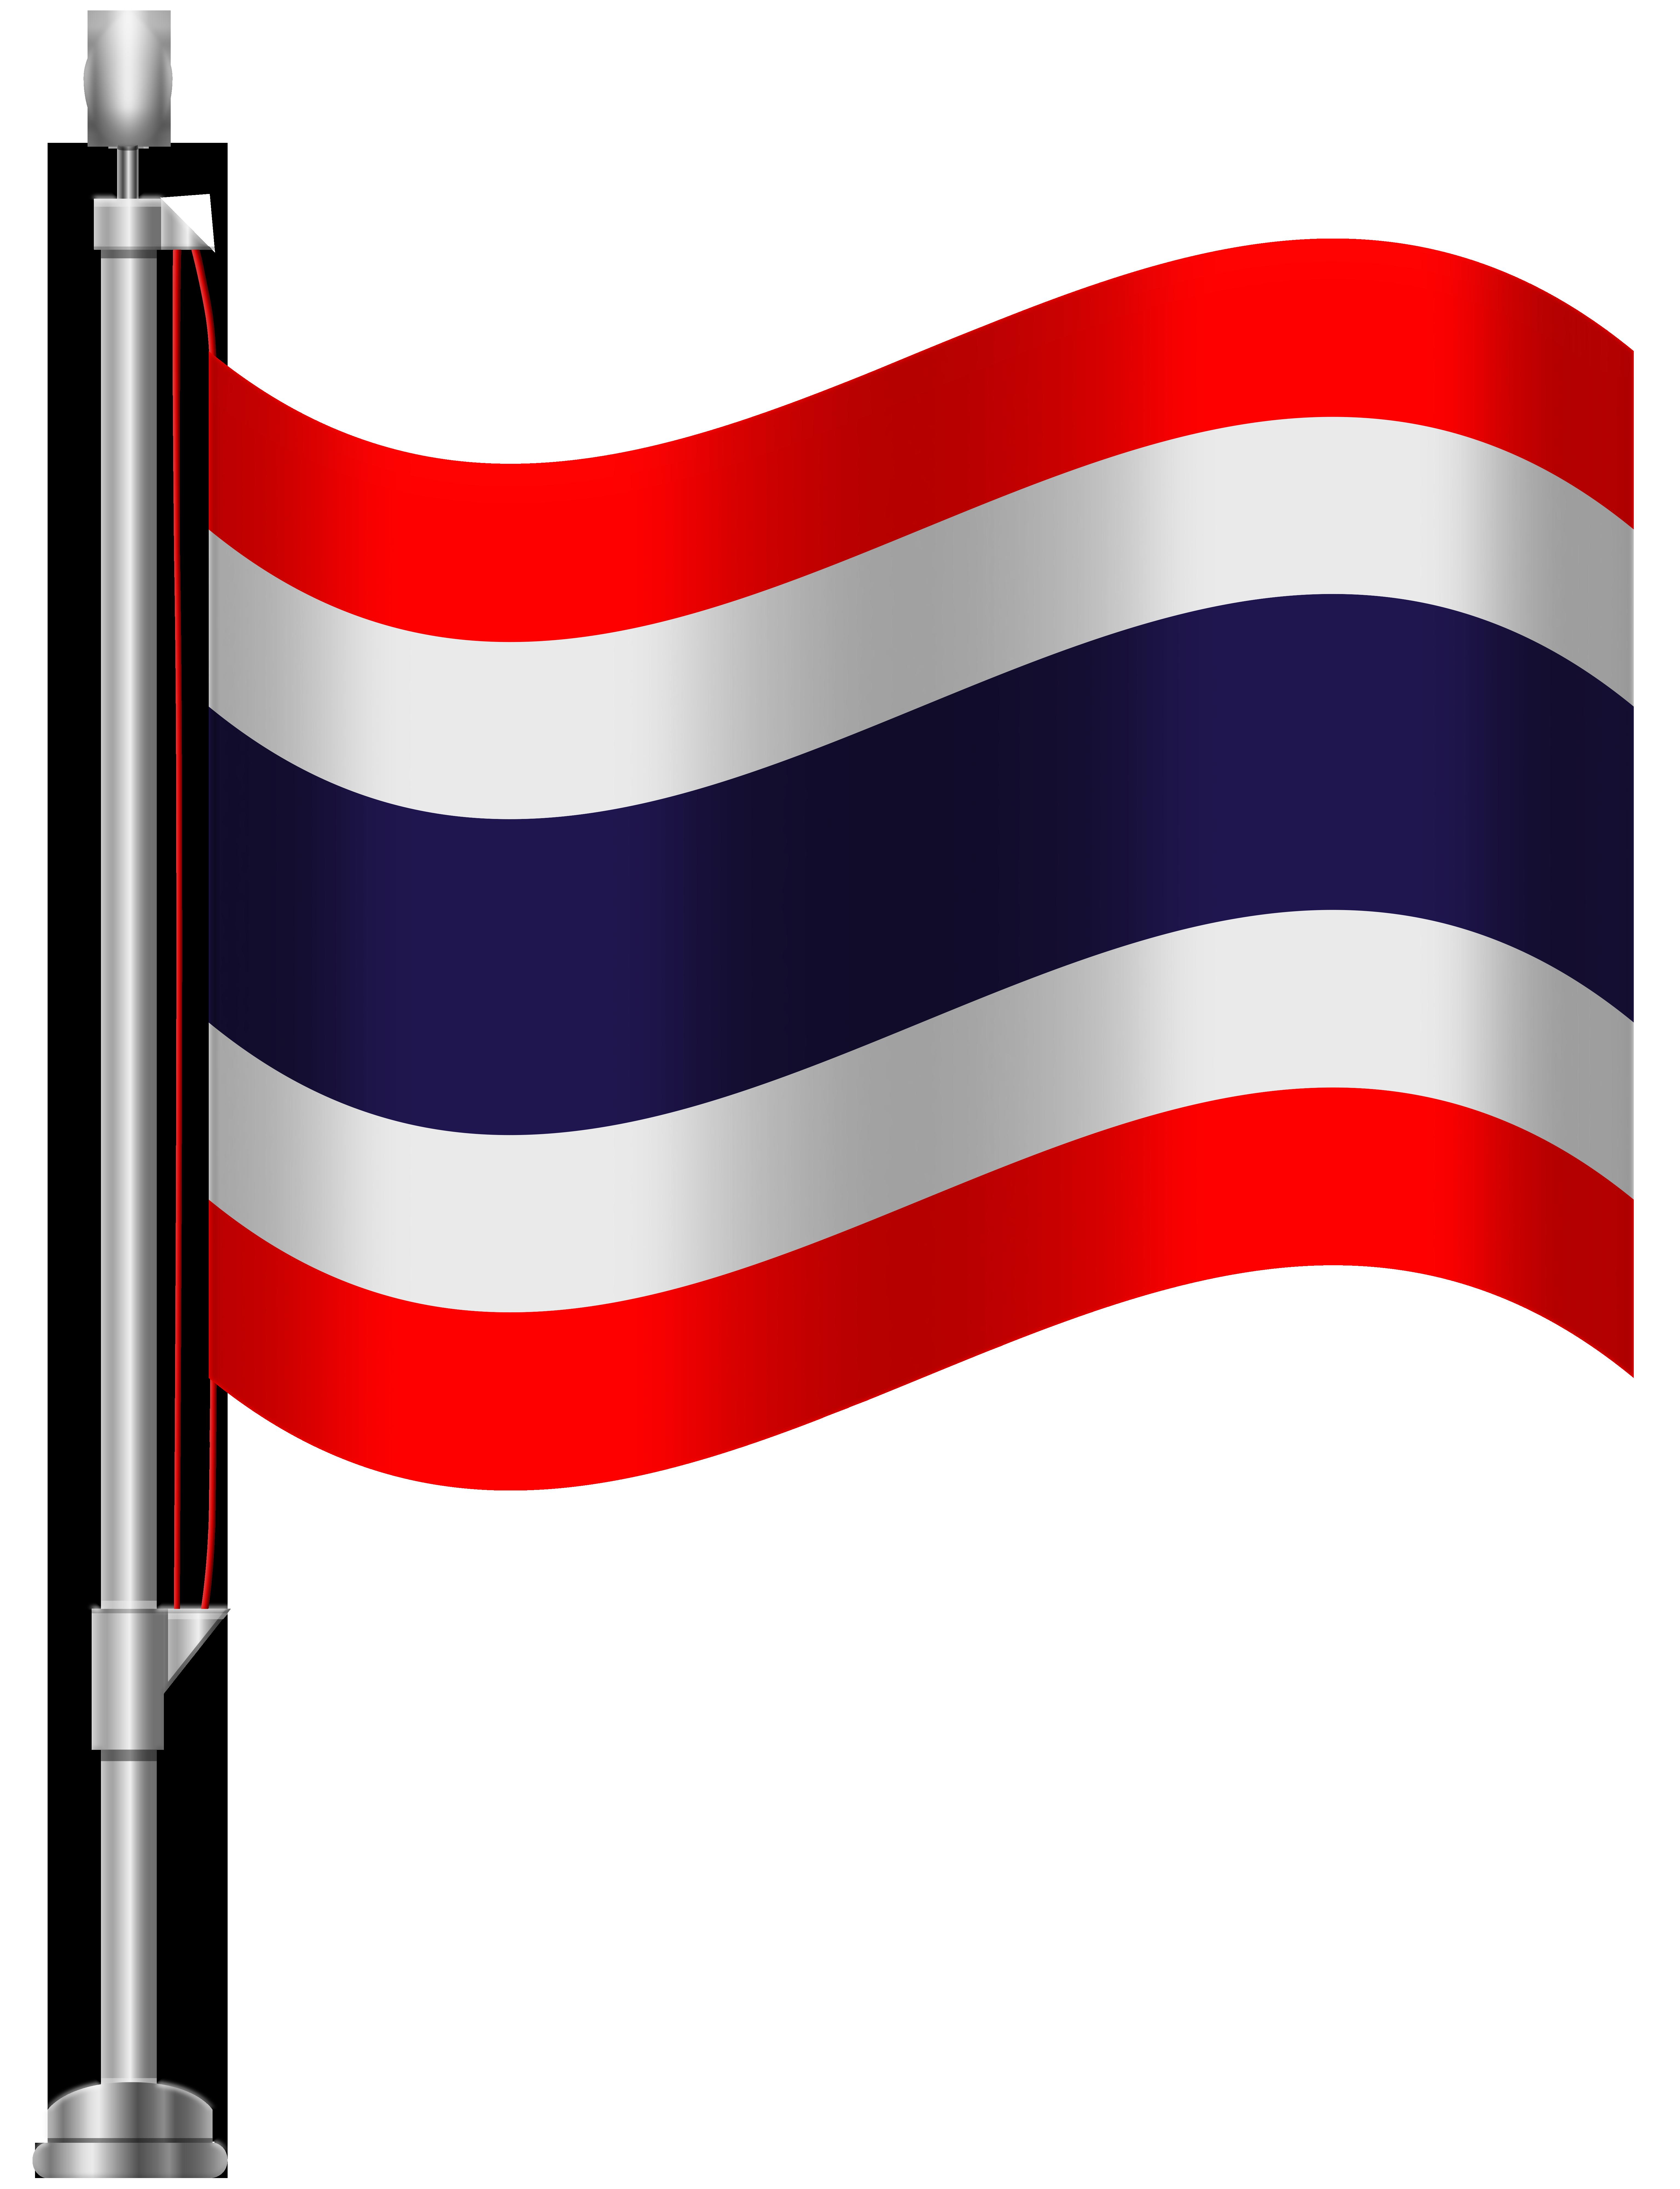 6141x8000 Thailand Flag Png Clip Art